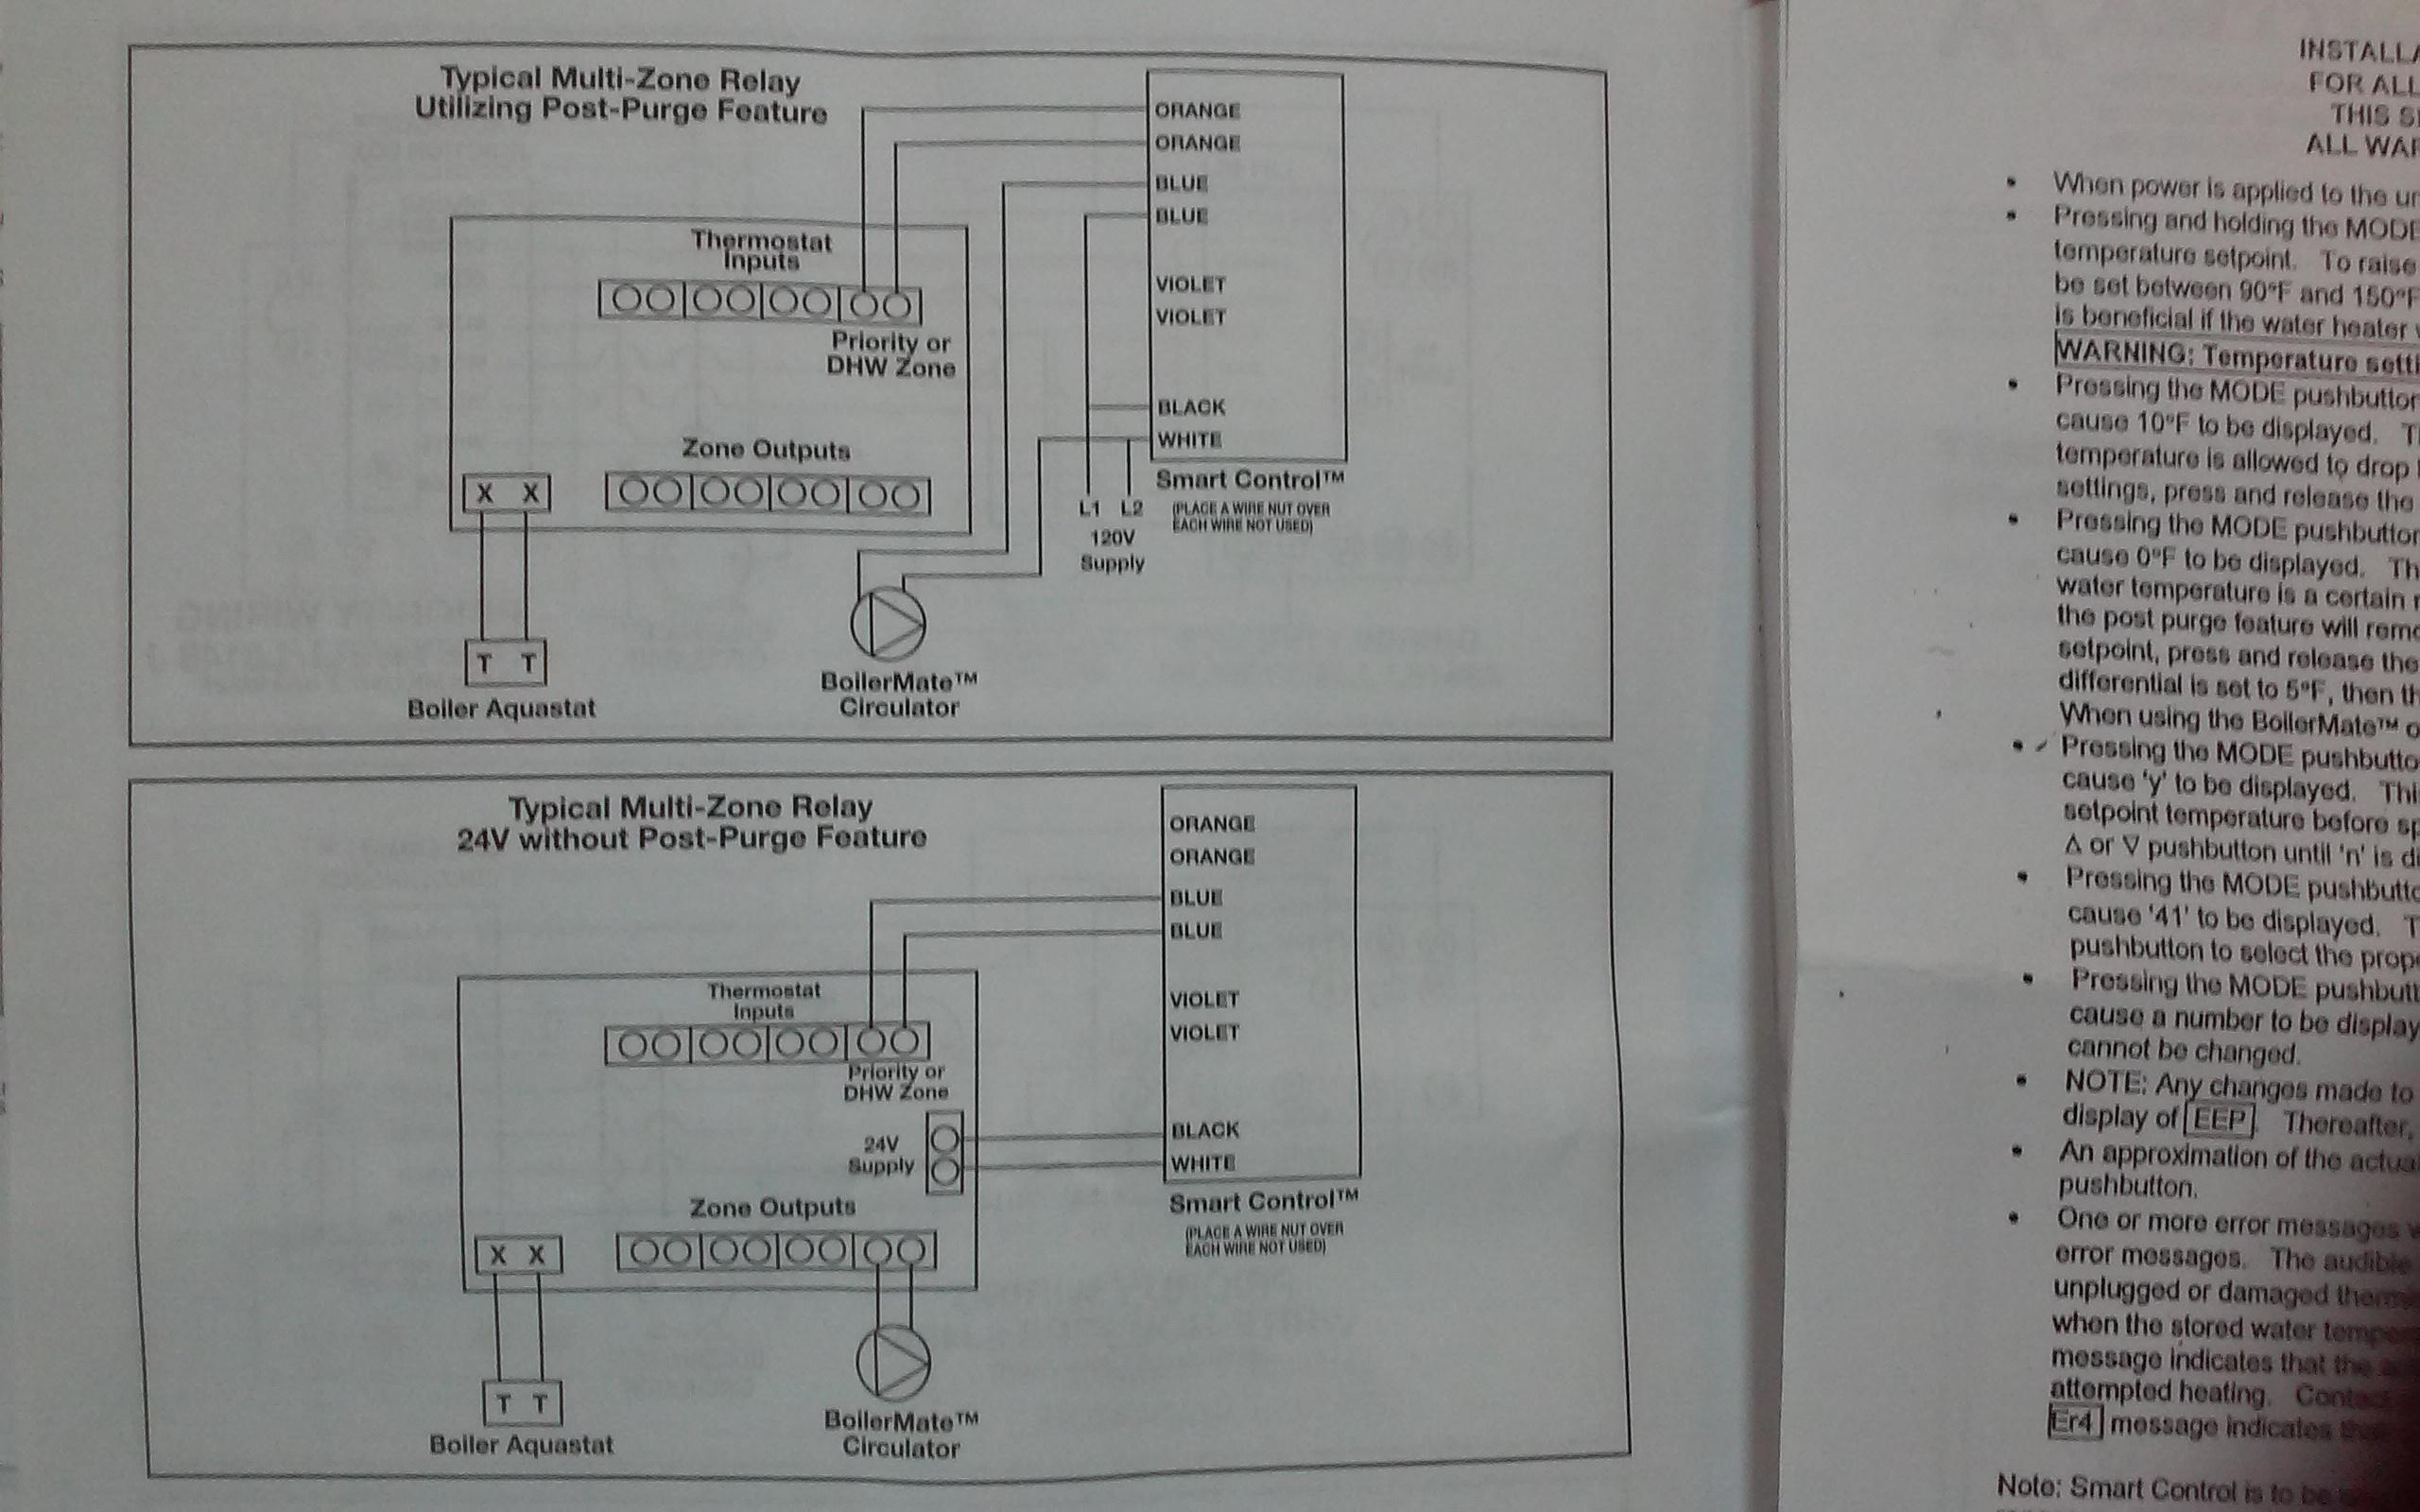 amtrol wiring diagram best wiring library Tjernlund Wiring Diagram amtrol wiring diagram